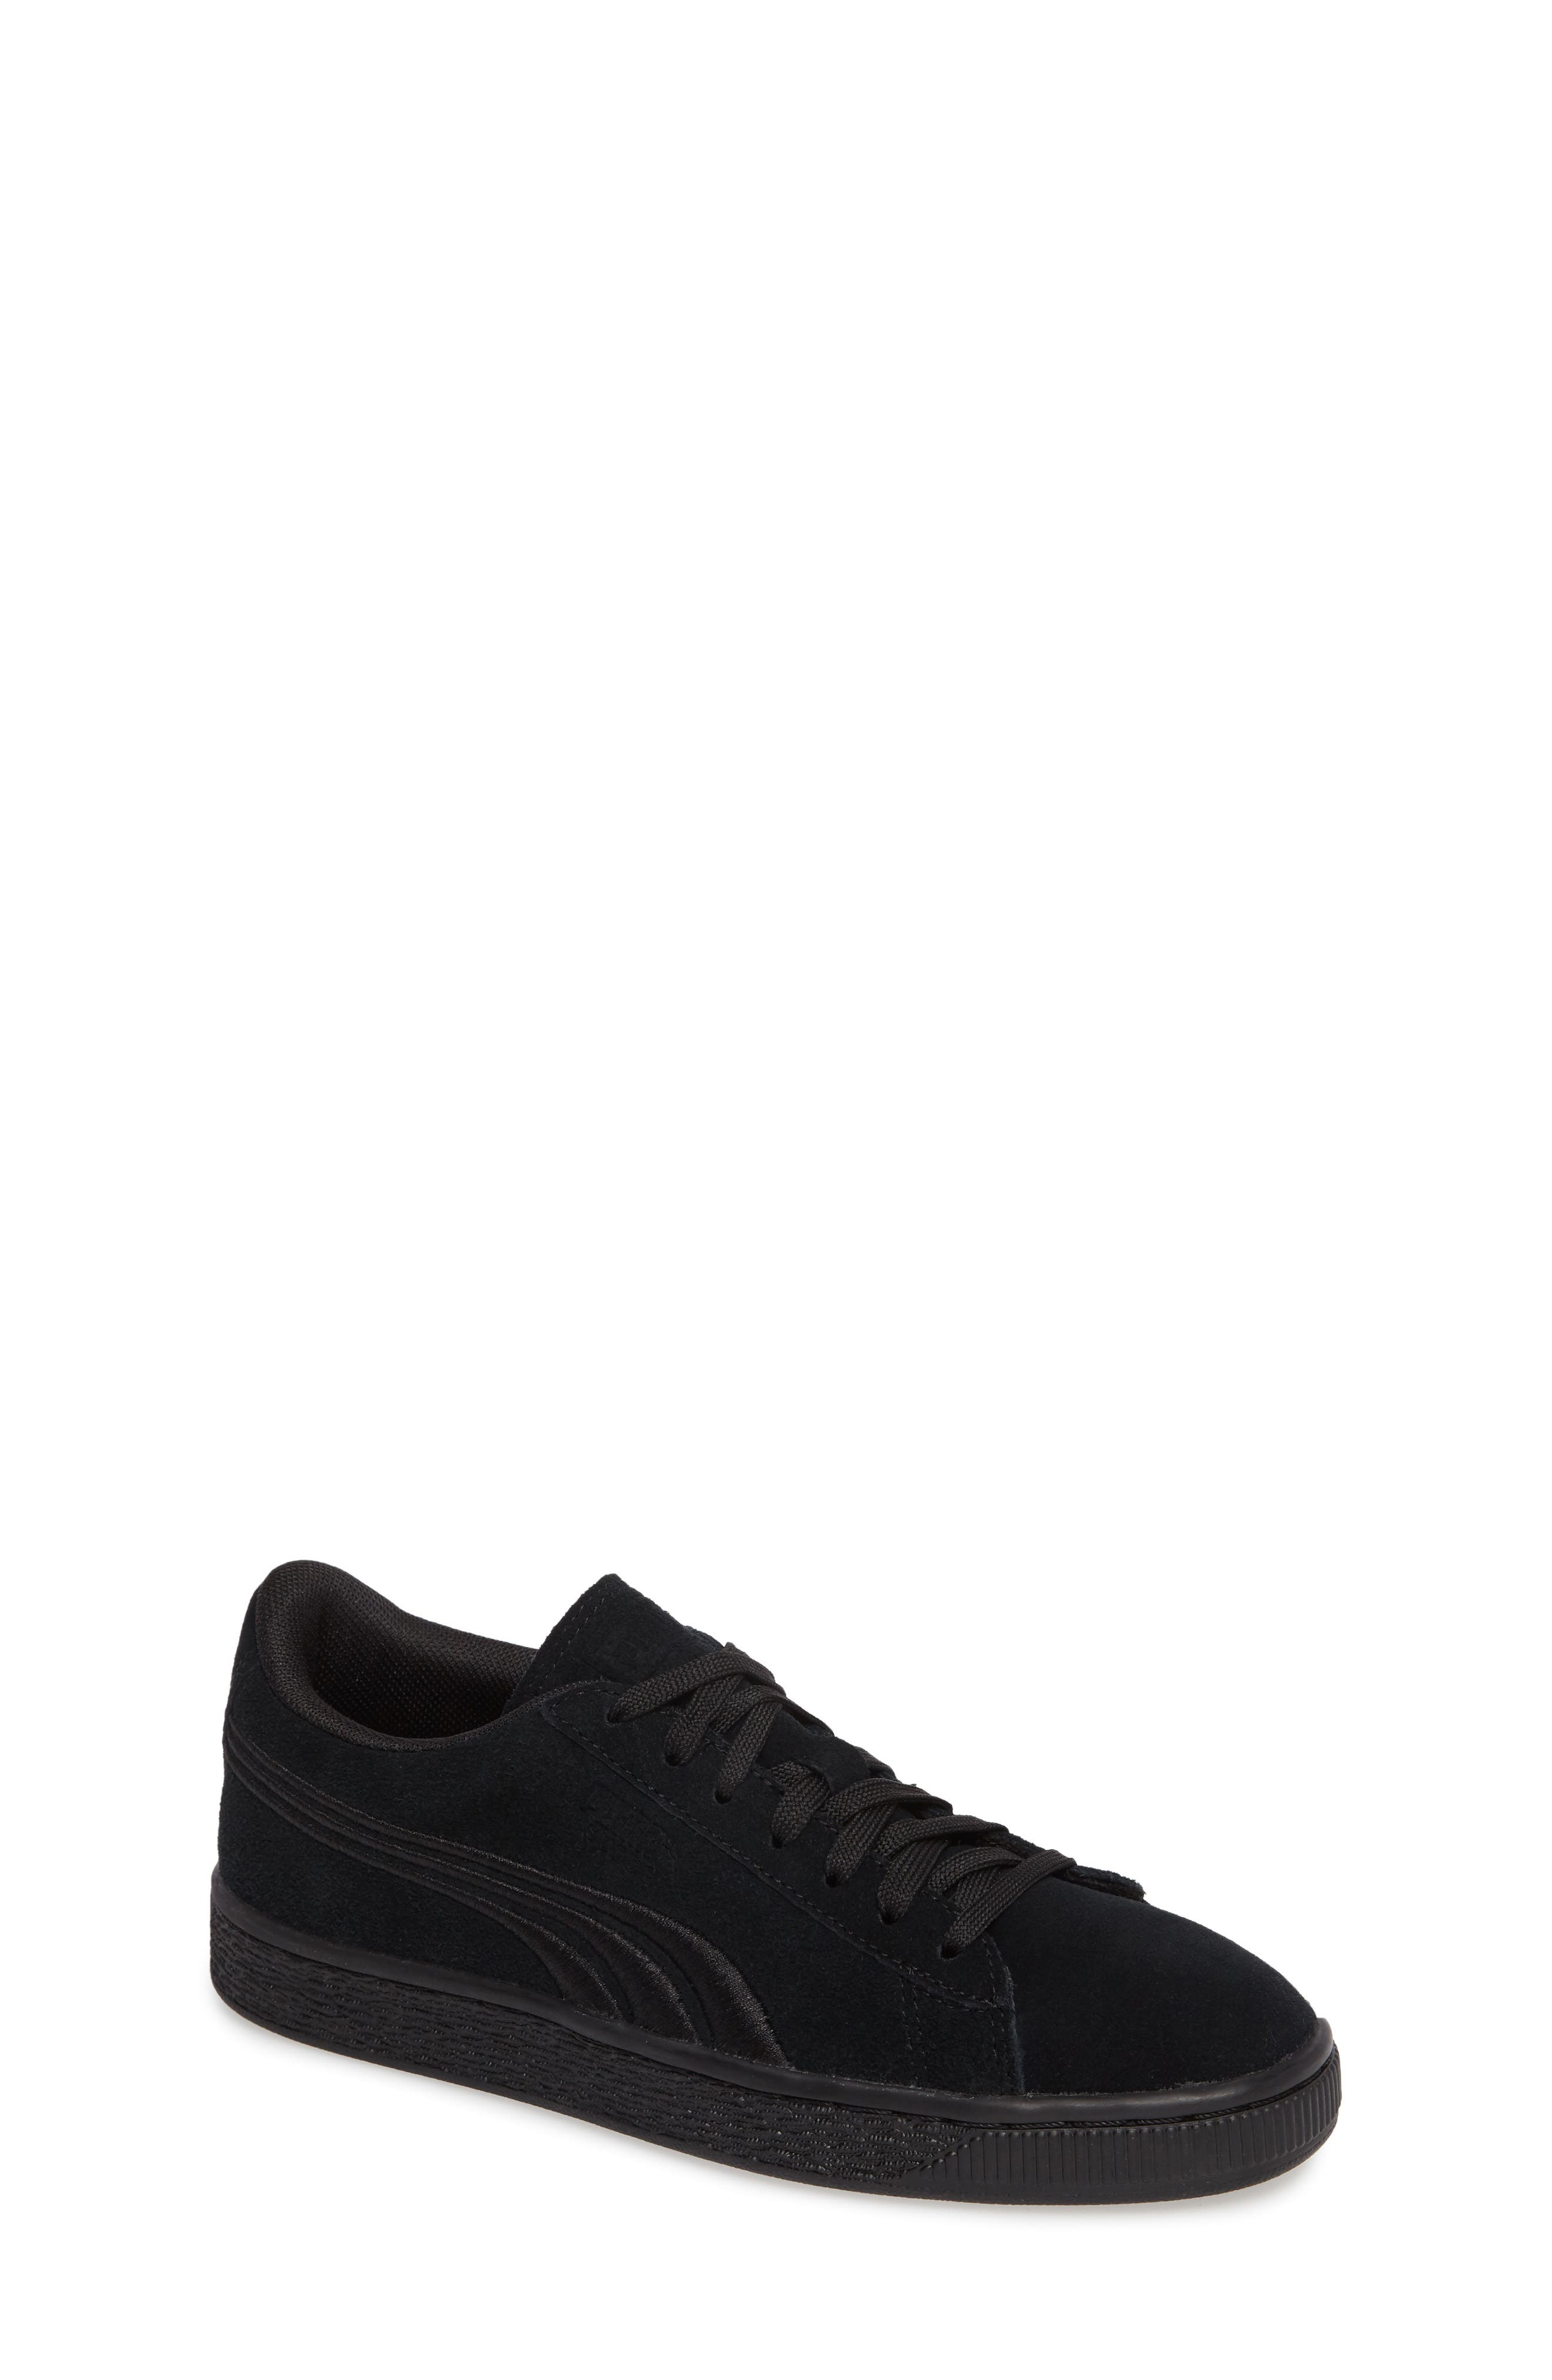 Suede Classic Badge Jr. Sneaker,                             Main thumbnail 1, color,                             Black/ Black